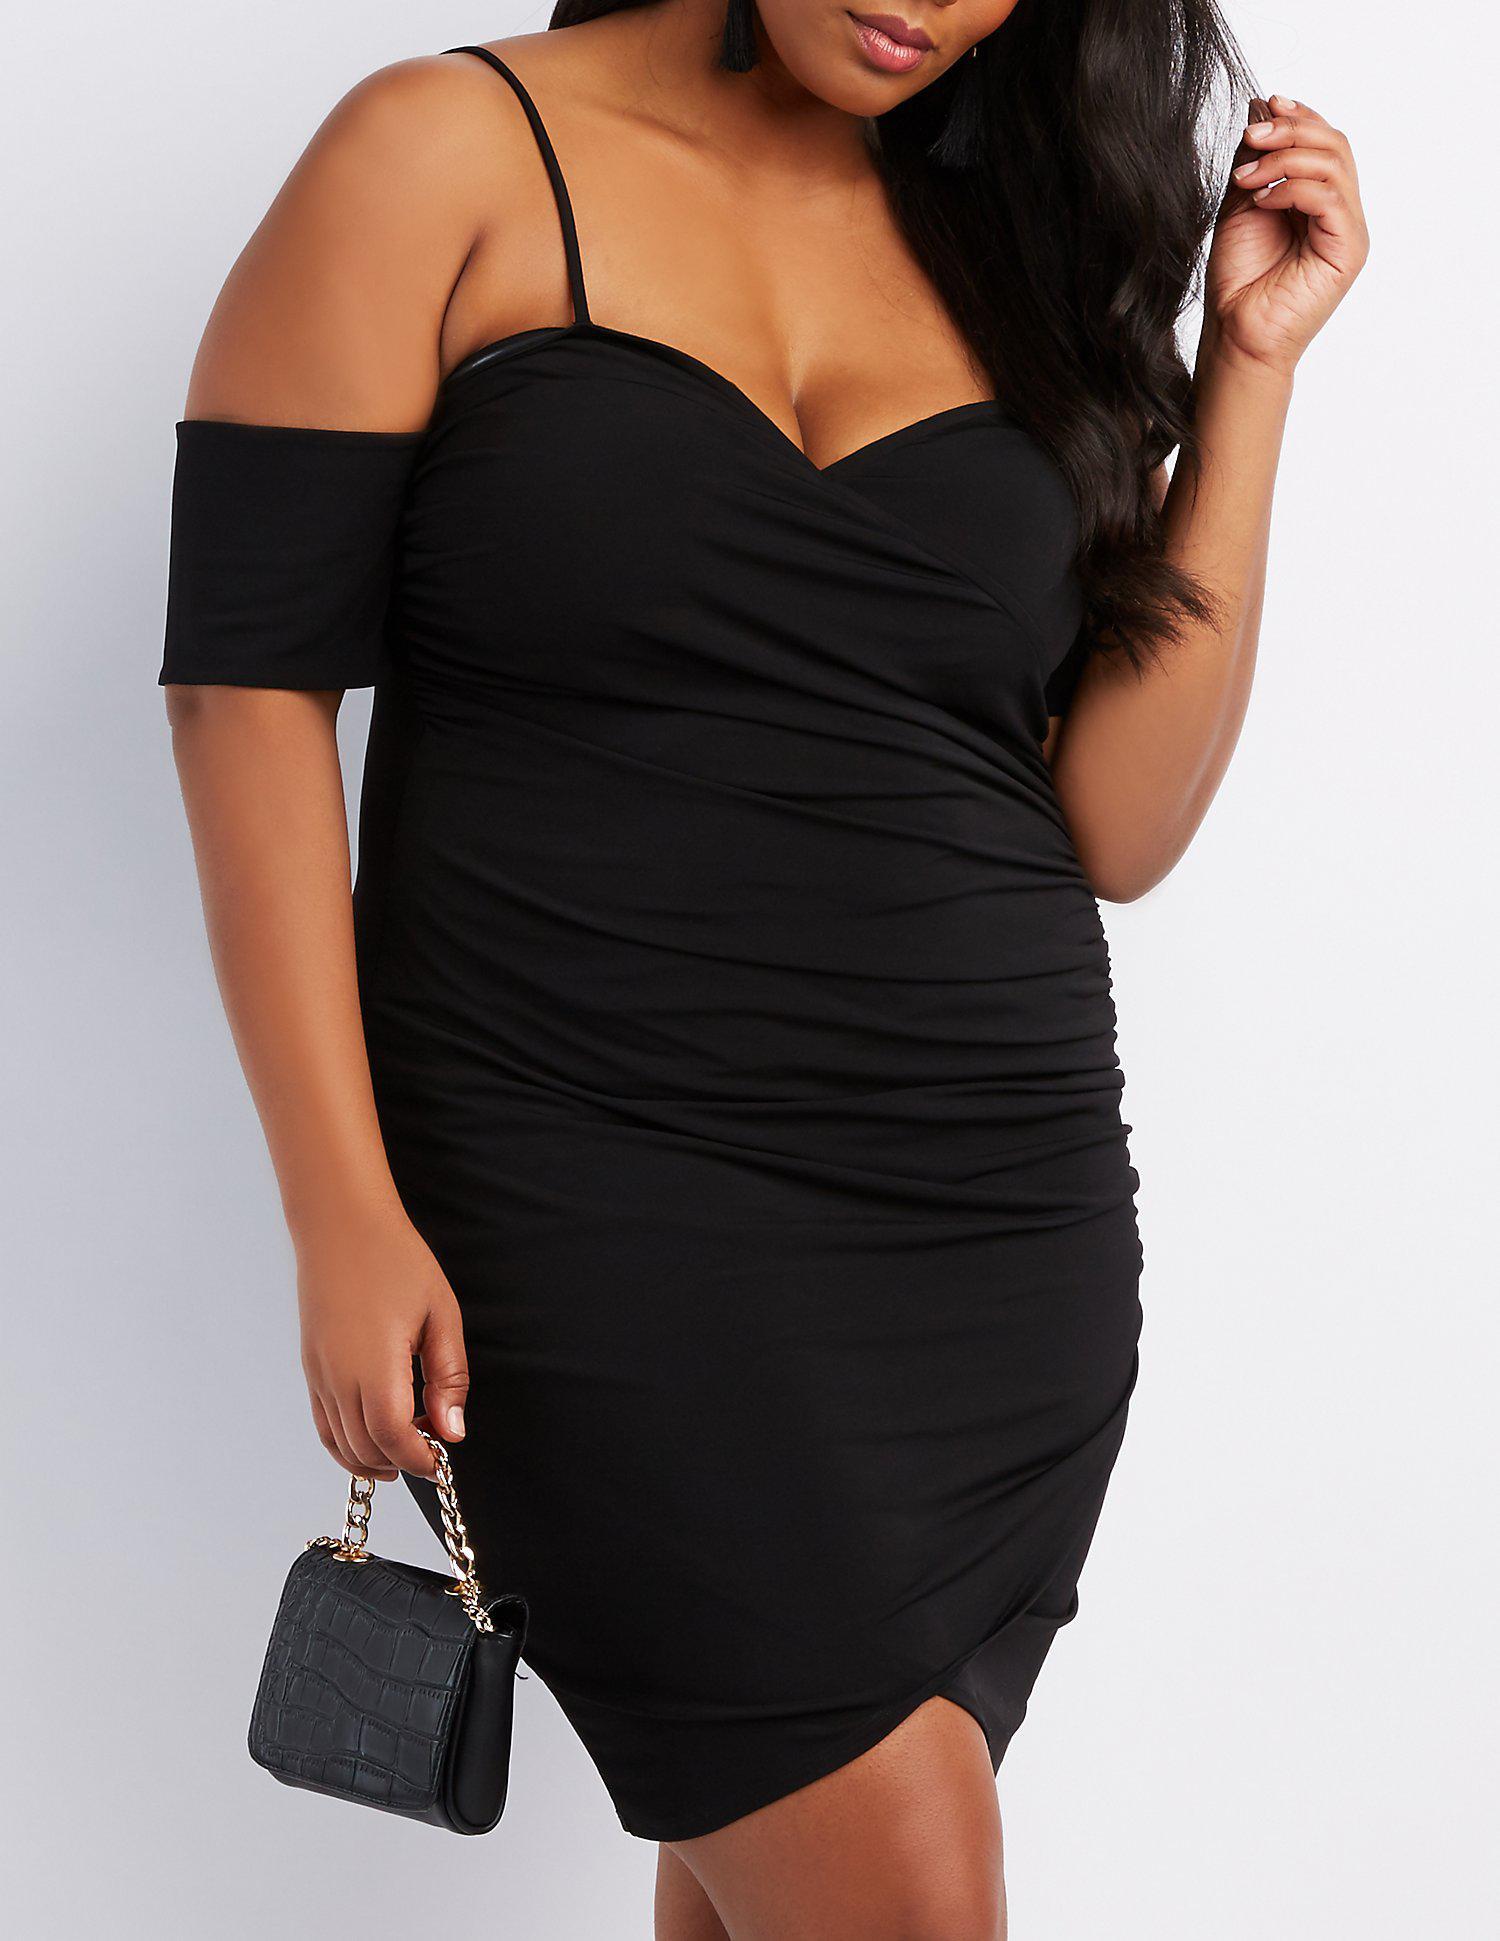 Plus Size Black Dresses Charlotte Russe - raveitsafe